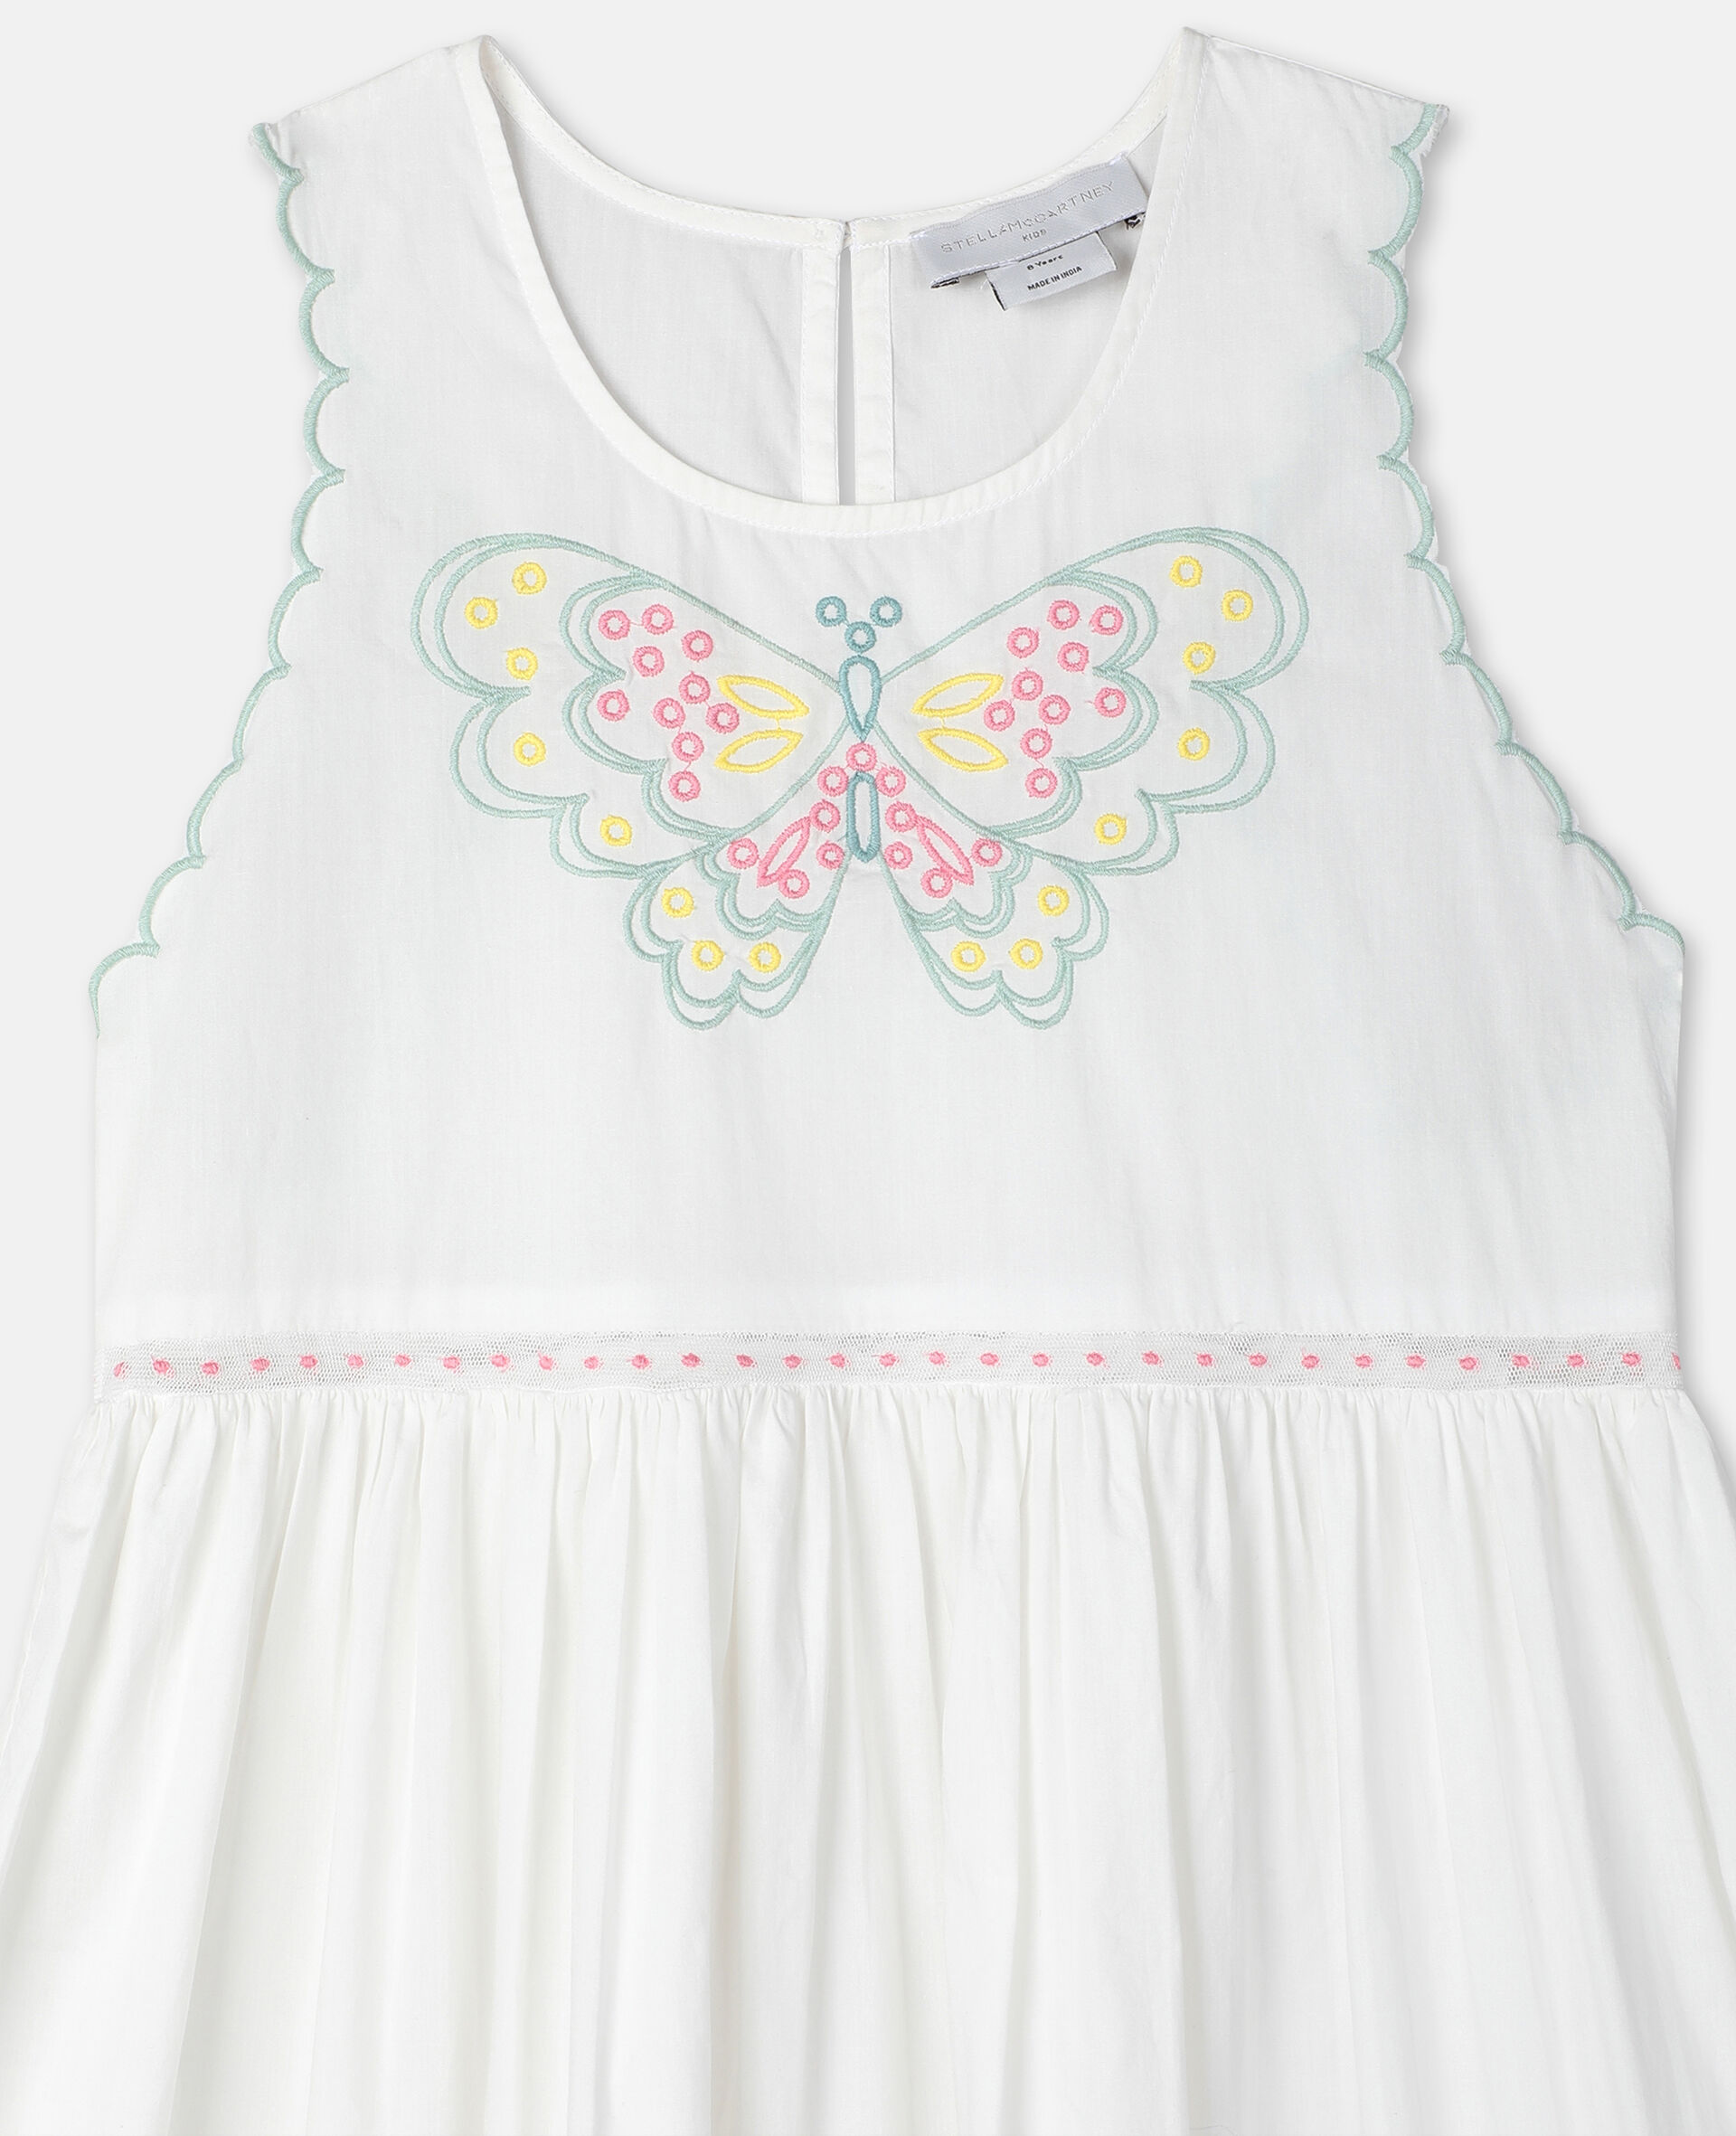 Butterfly刺绣棉质连衣裙-白色-large image number 2